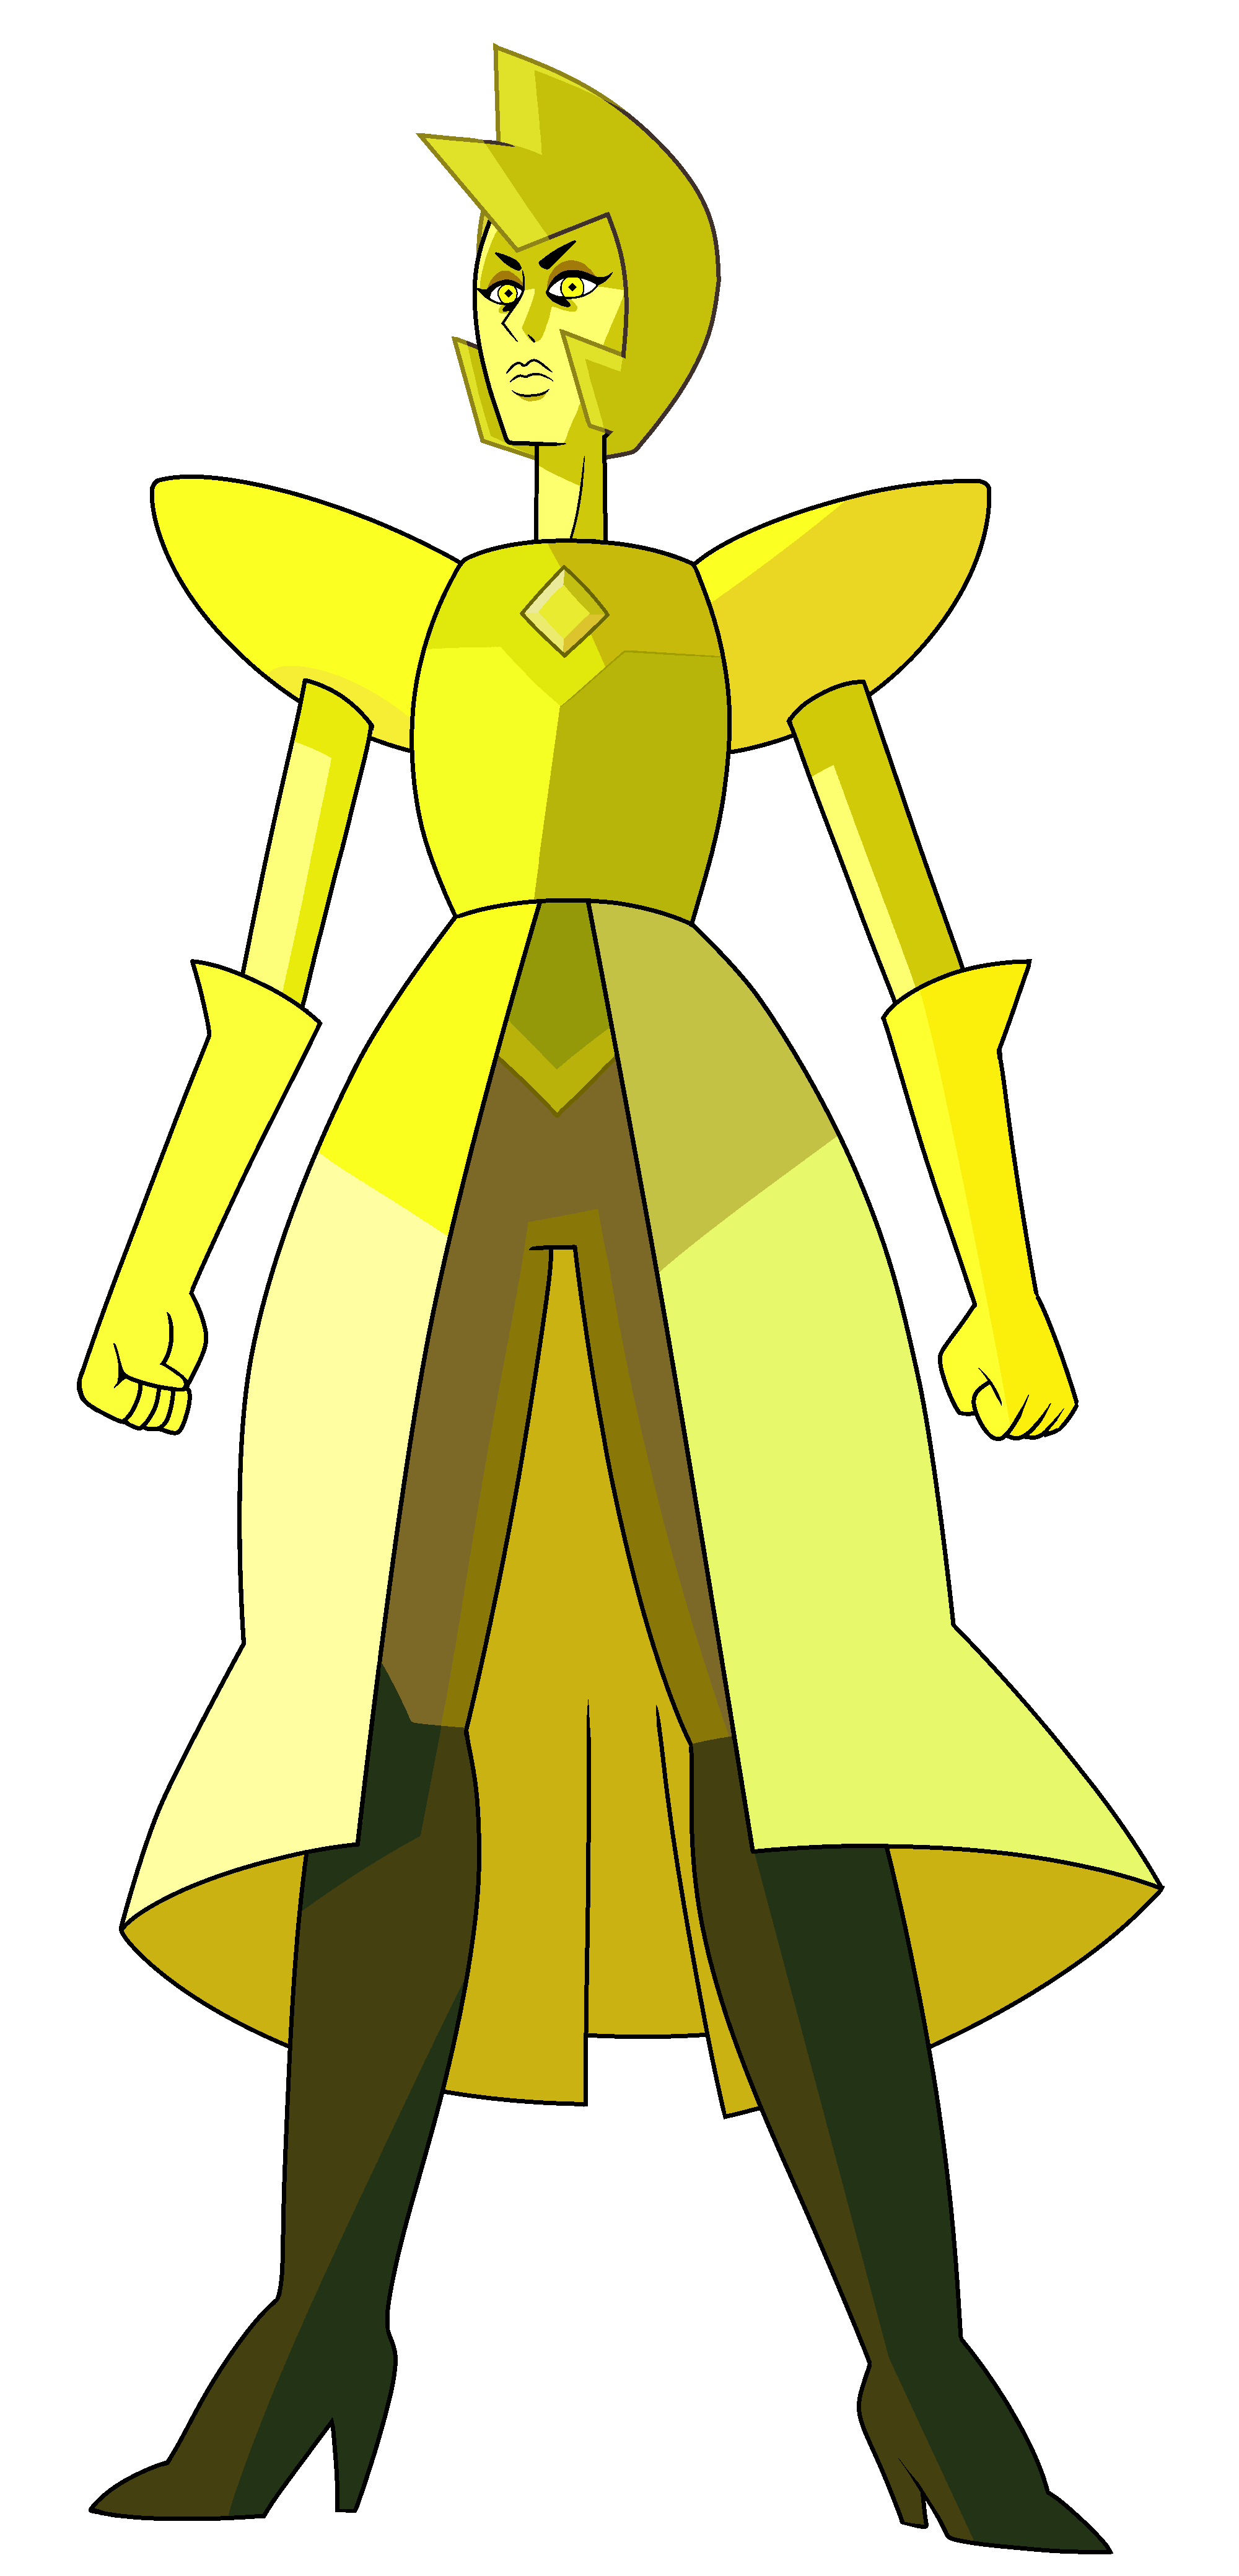 Steven Universe Theory Are The Diamonds Fusions By Hitmonchanman